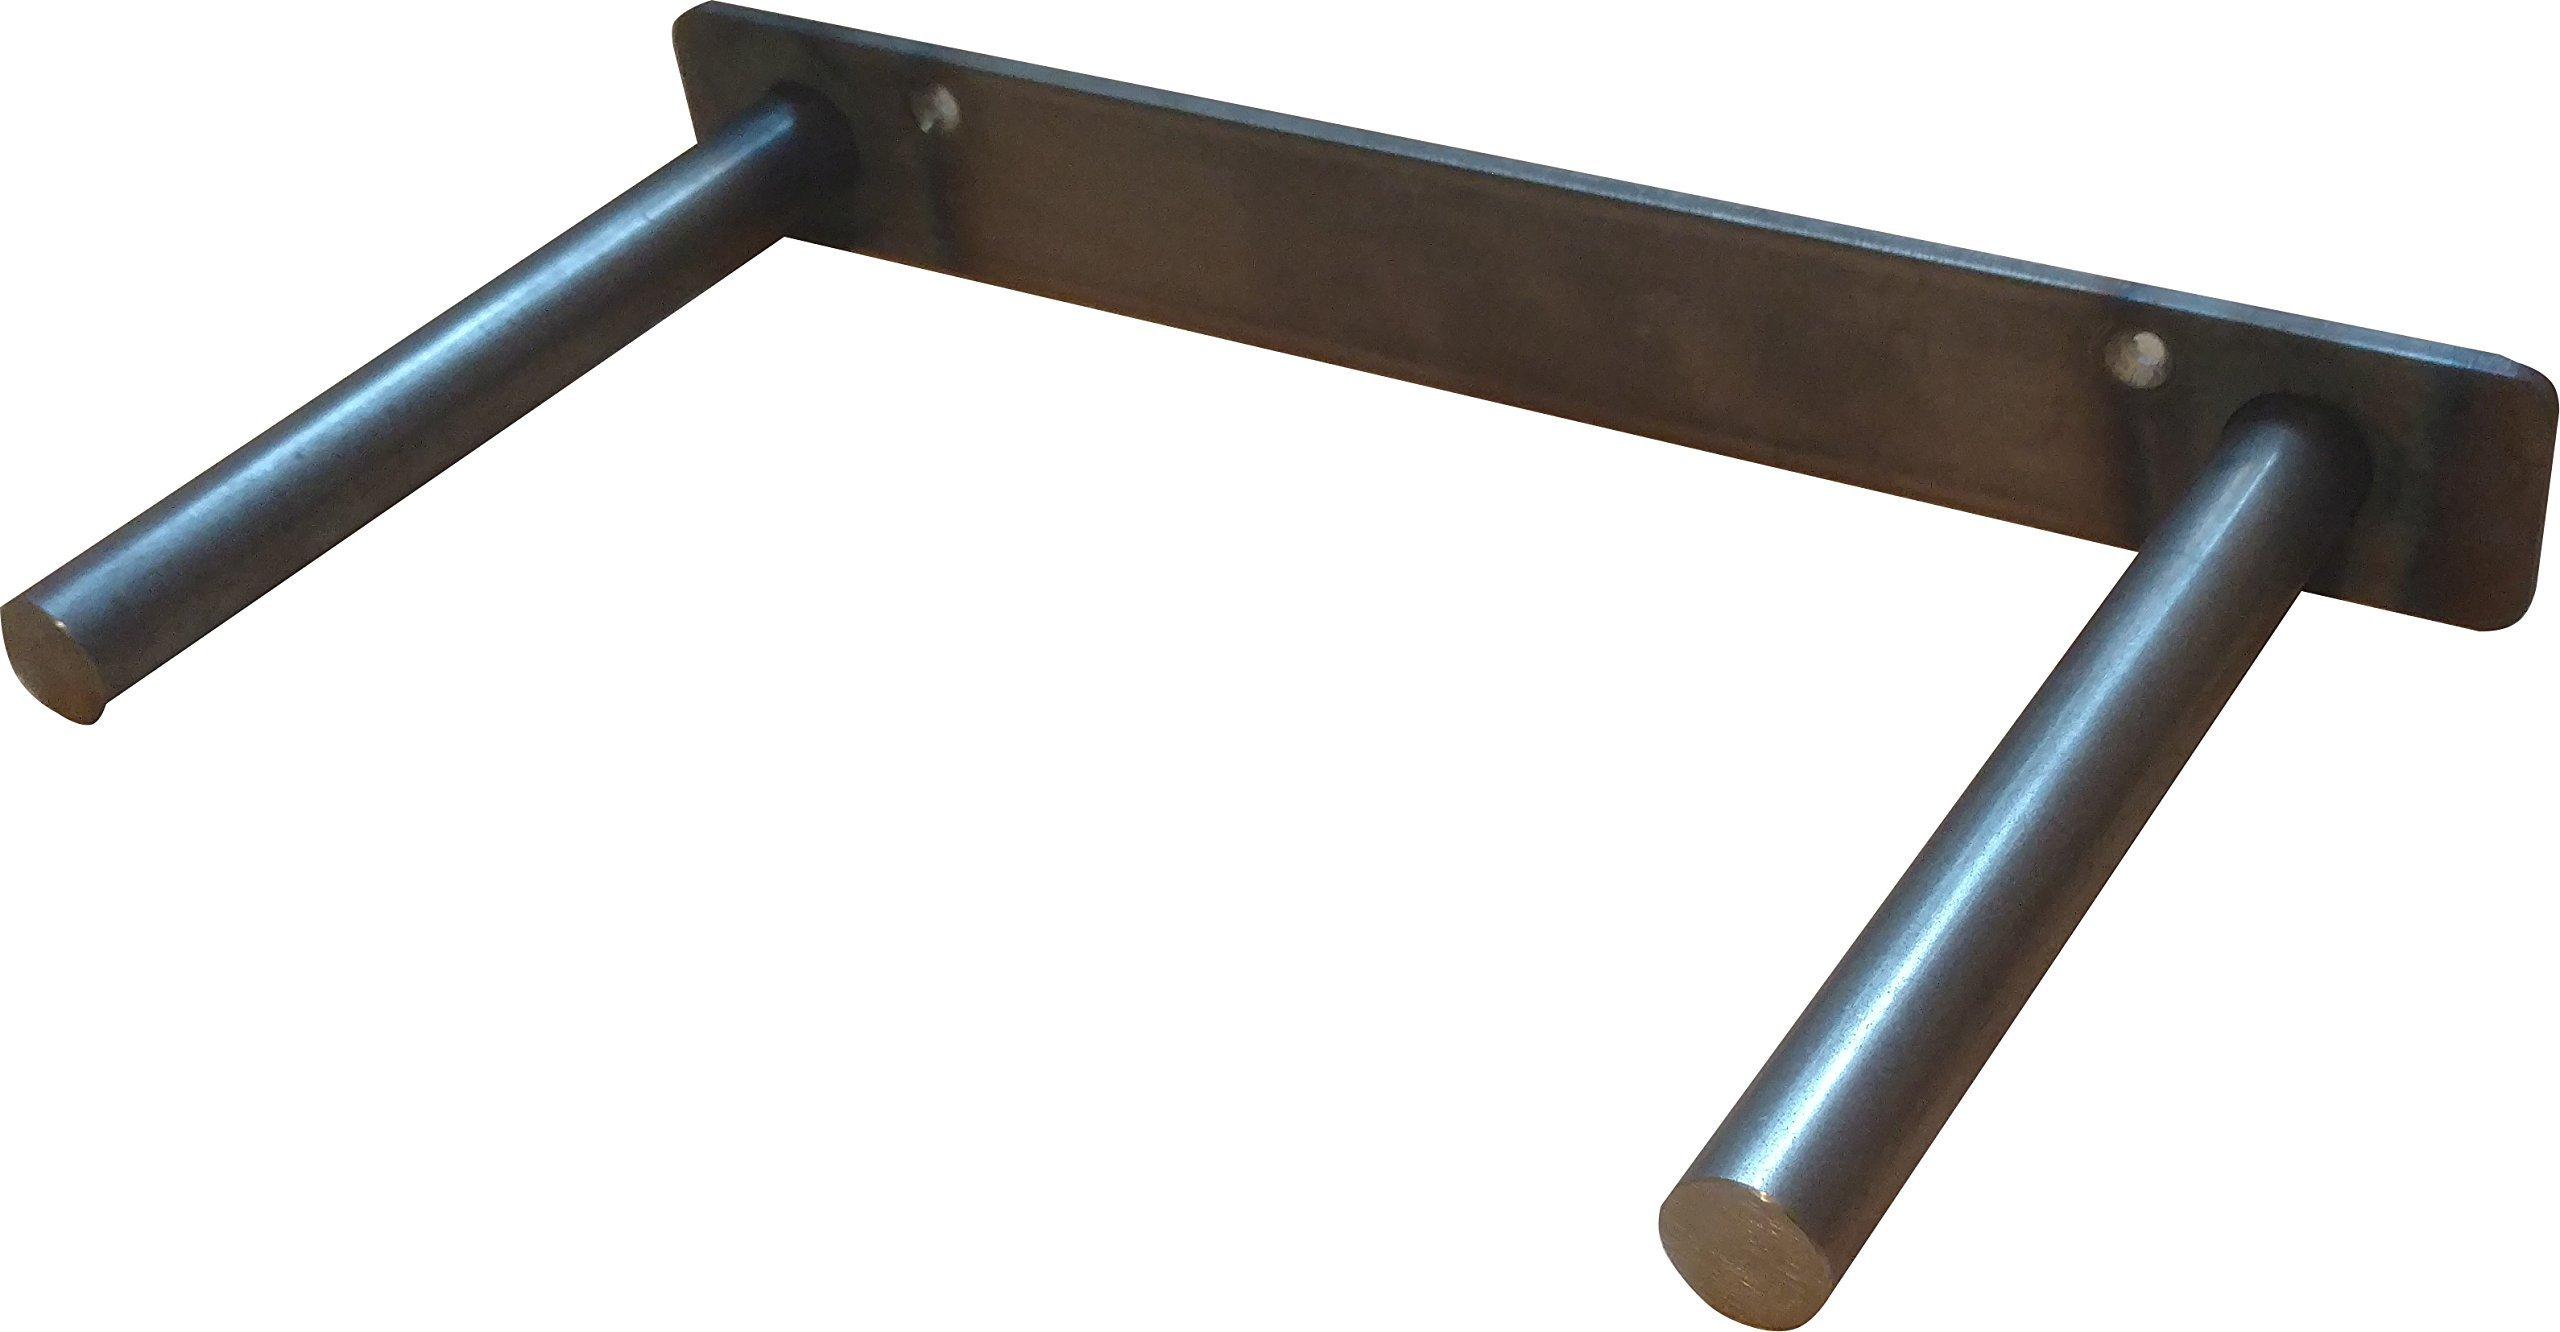 12'' Solid Steel Floating Shelf Bracket Heavy Duty MADE IN THE USA